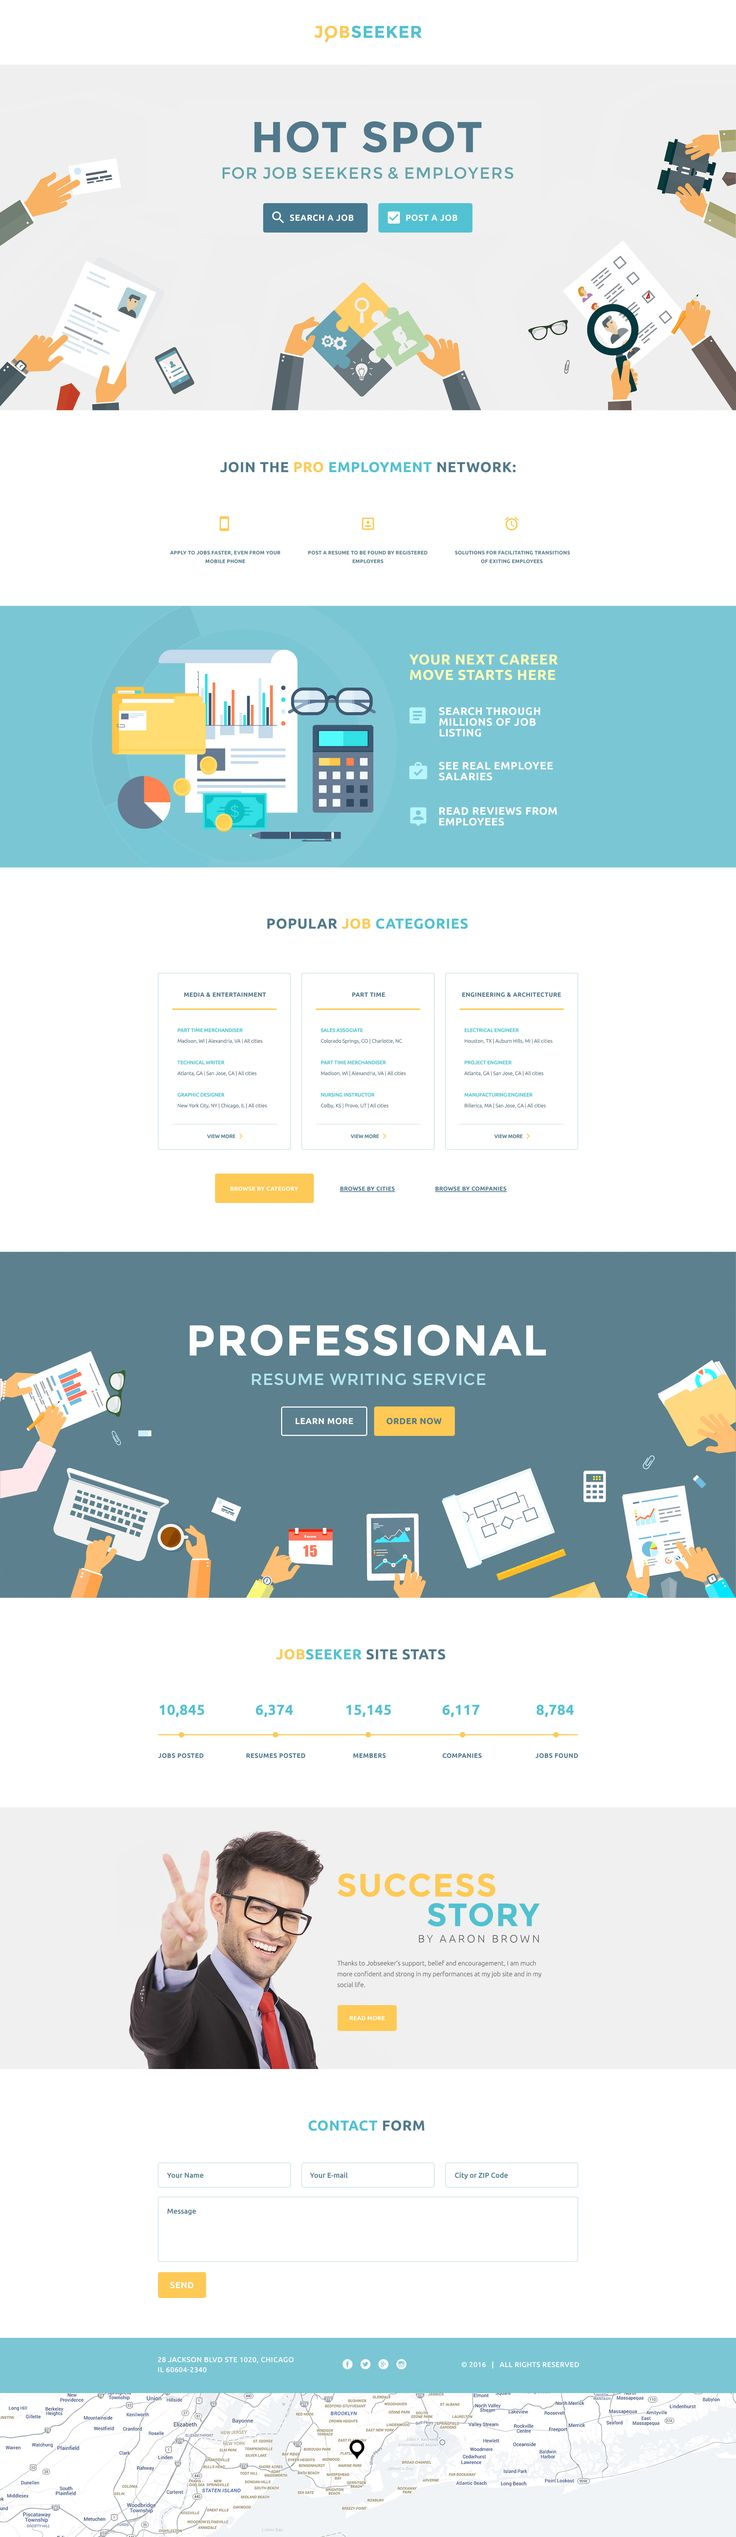 17 melhores ideias sobre job portal no layouts de job portal responsive landing page template 58516 templatemonster